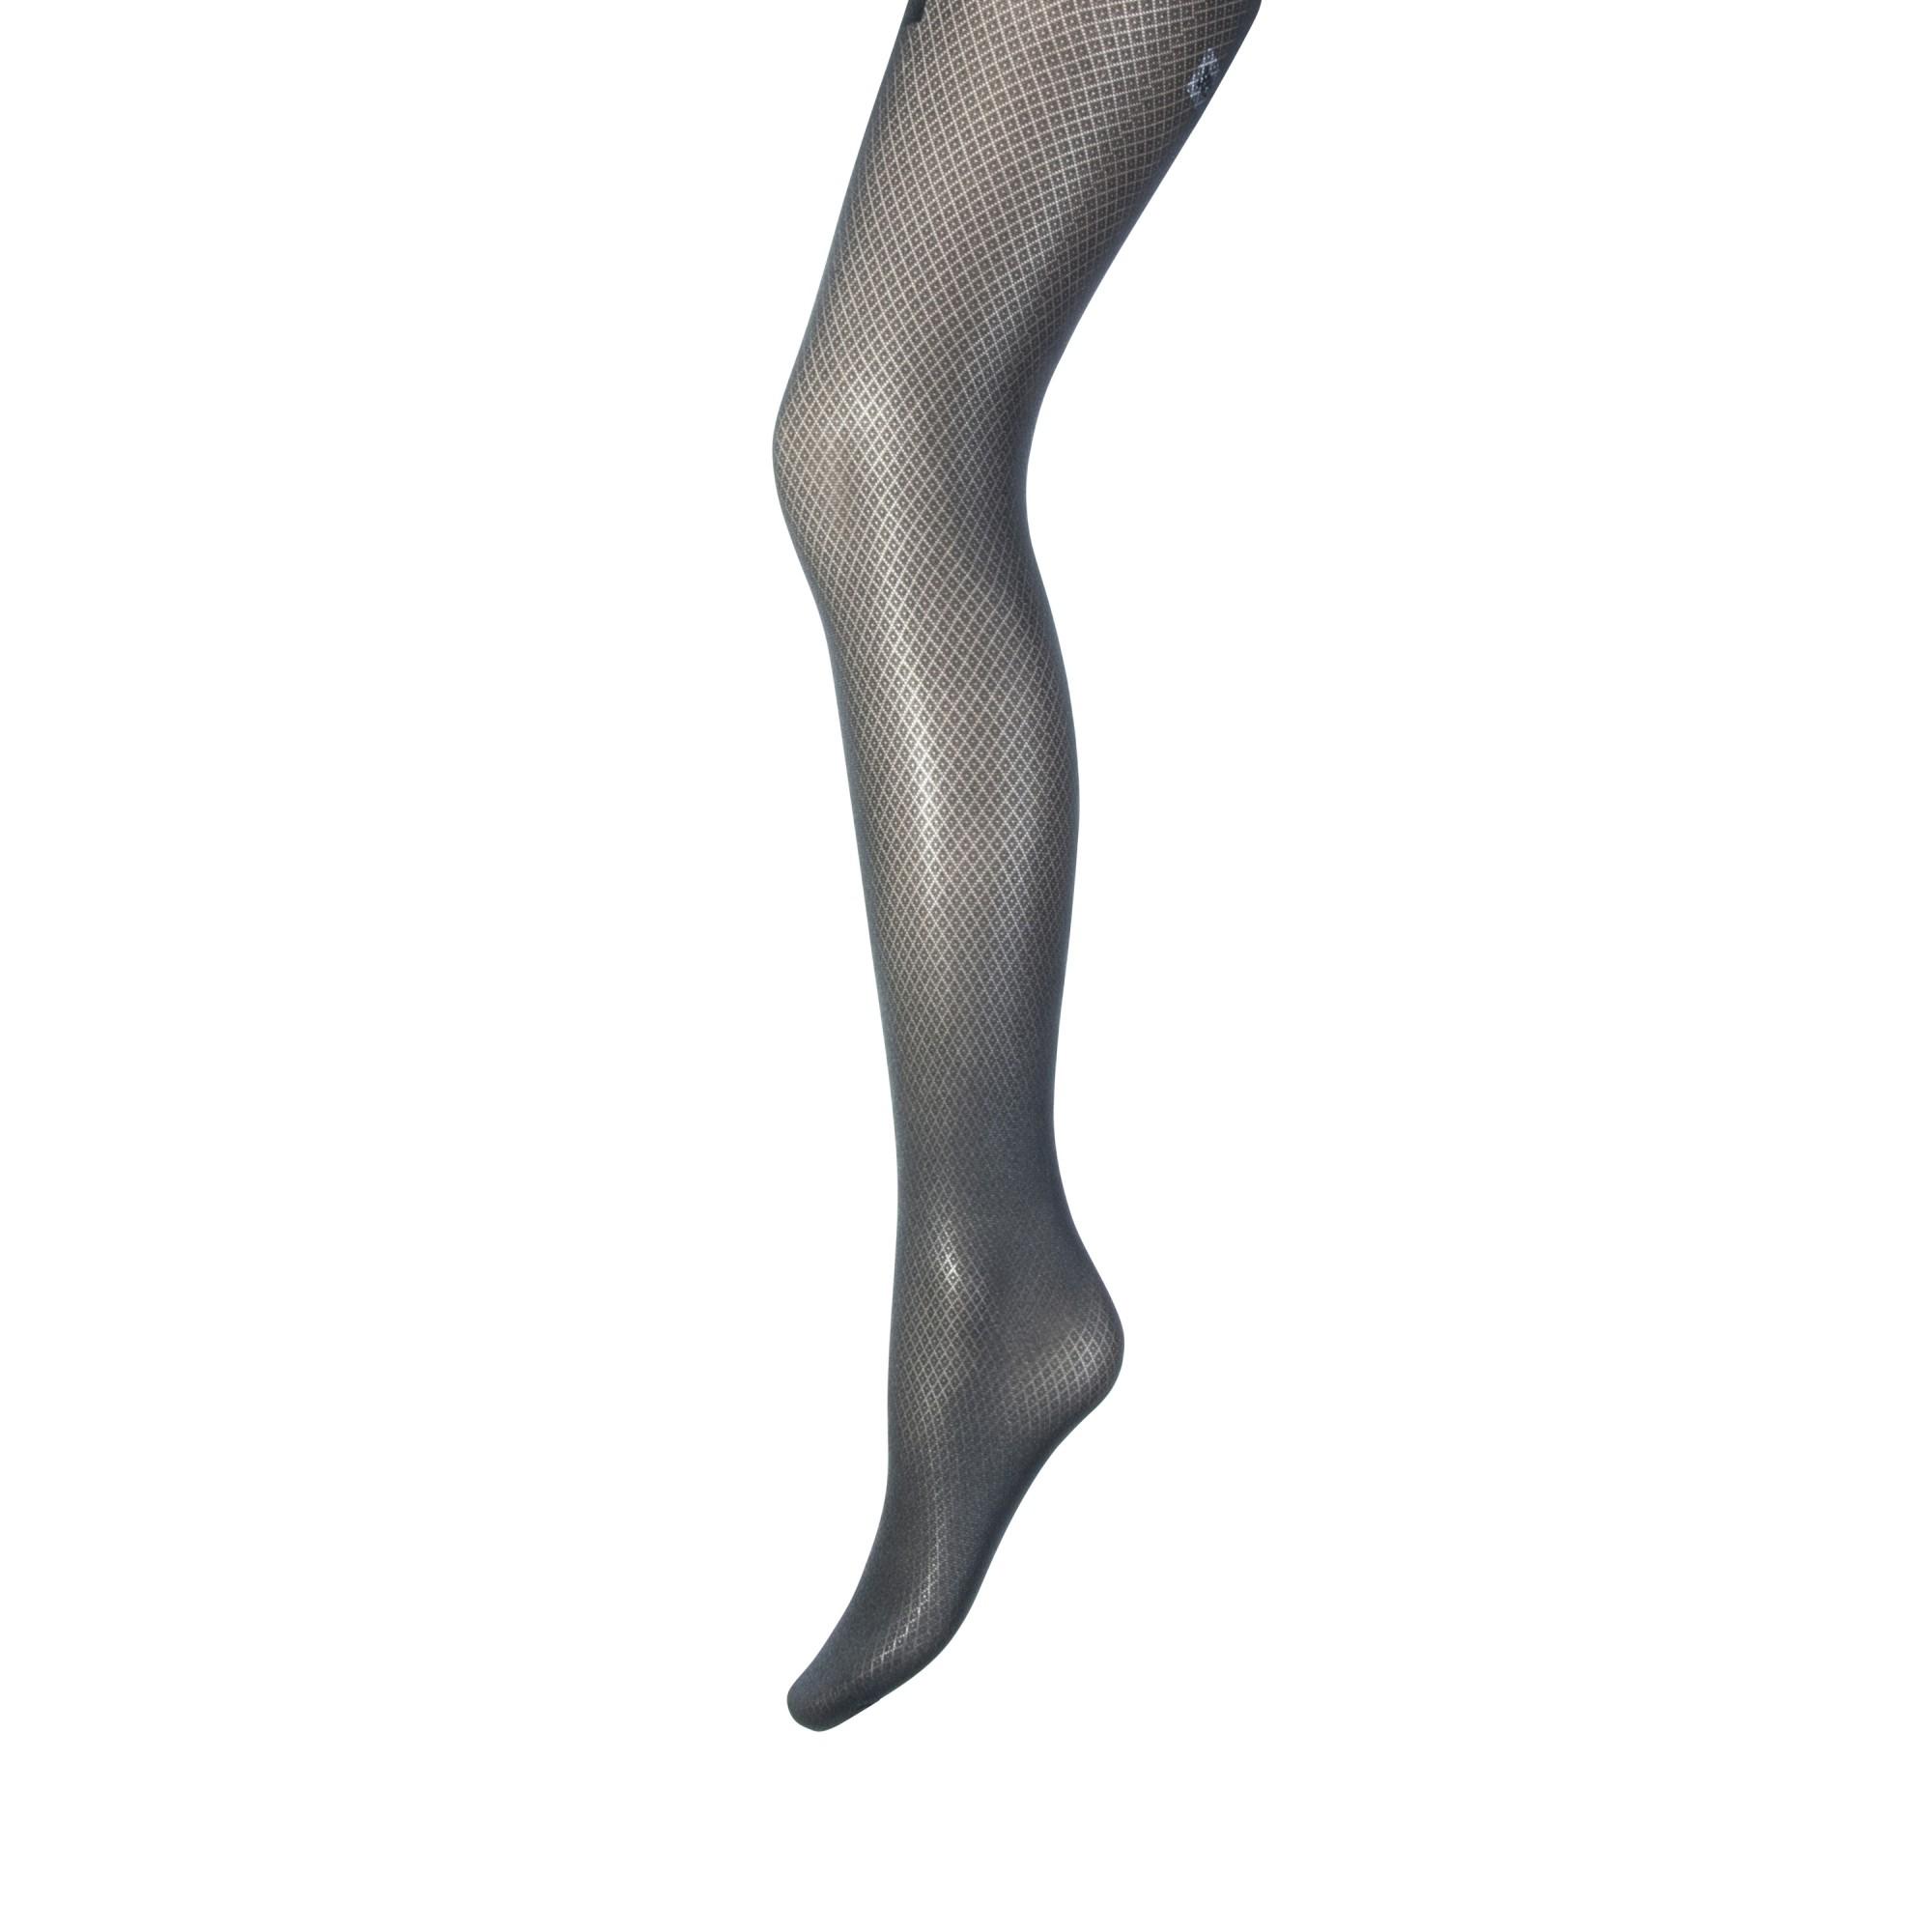 nieuwe release officiële winkel geweldige prijs Marianne Fashion Panty MARINE 30005